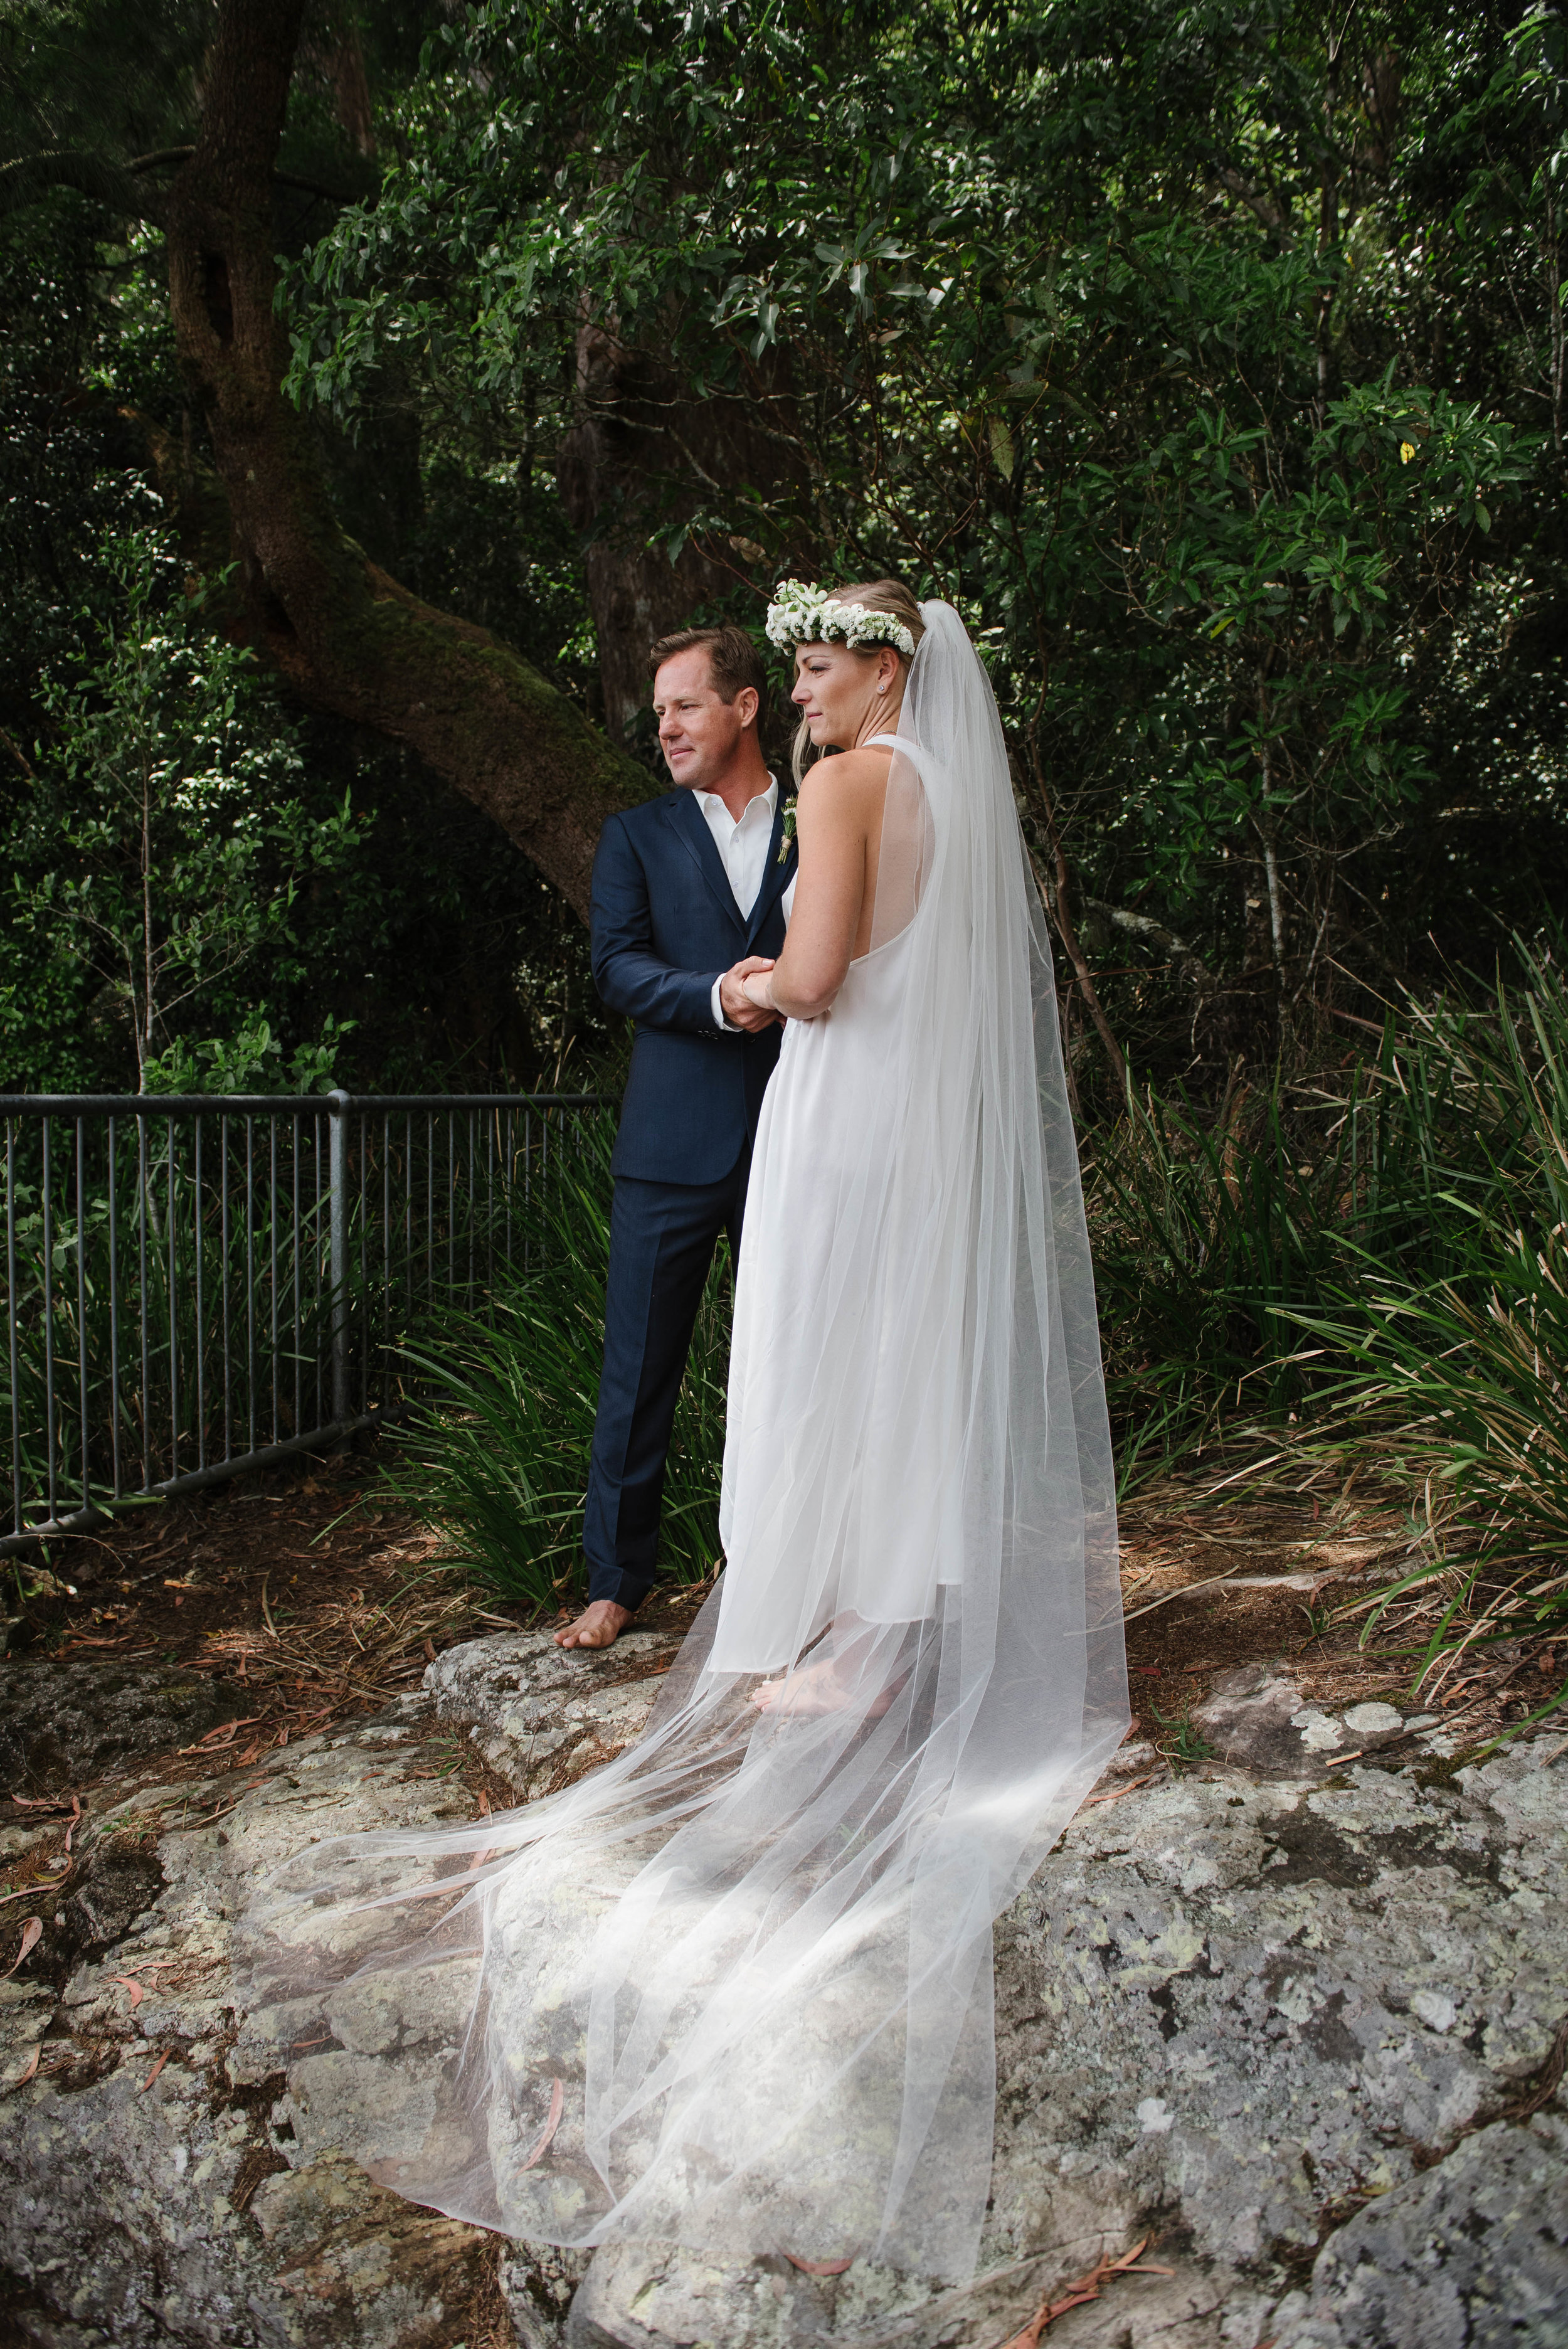 Carla and Luke- wedding photographer, byron bay wedding and family photographer, tweed heads wedding and family photography-188.jpg